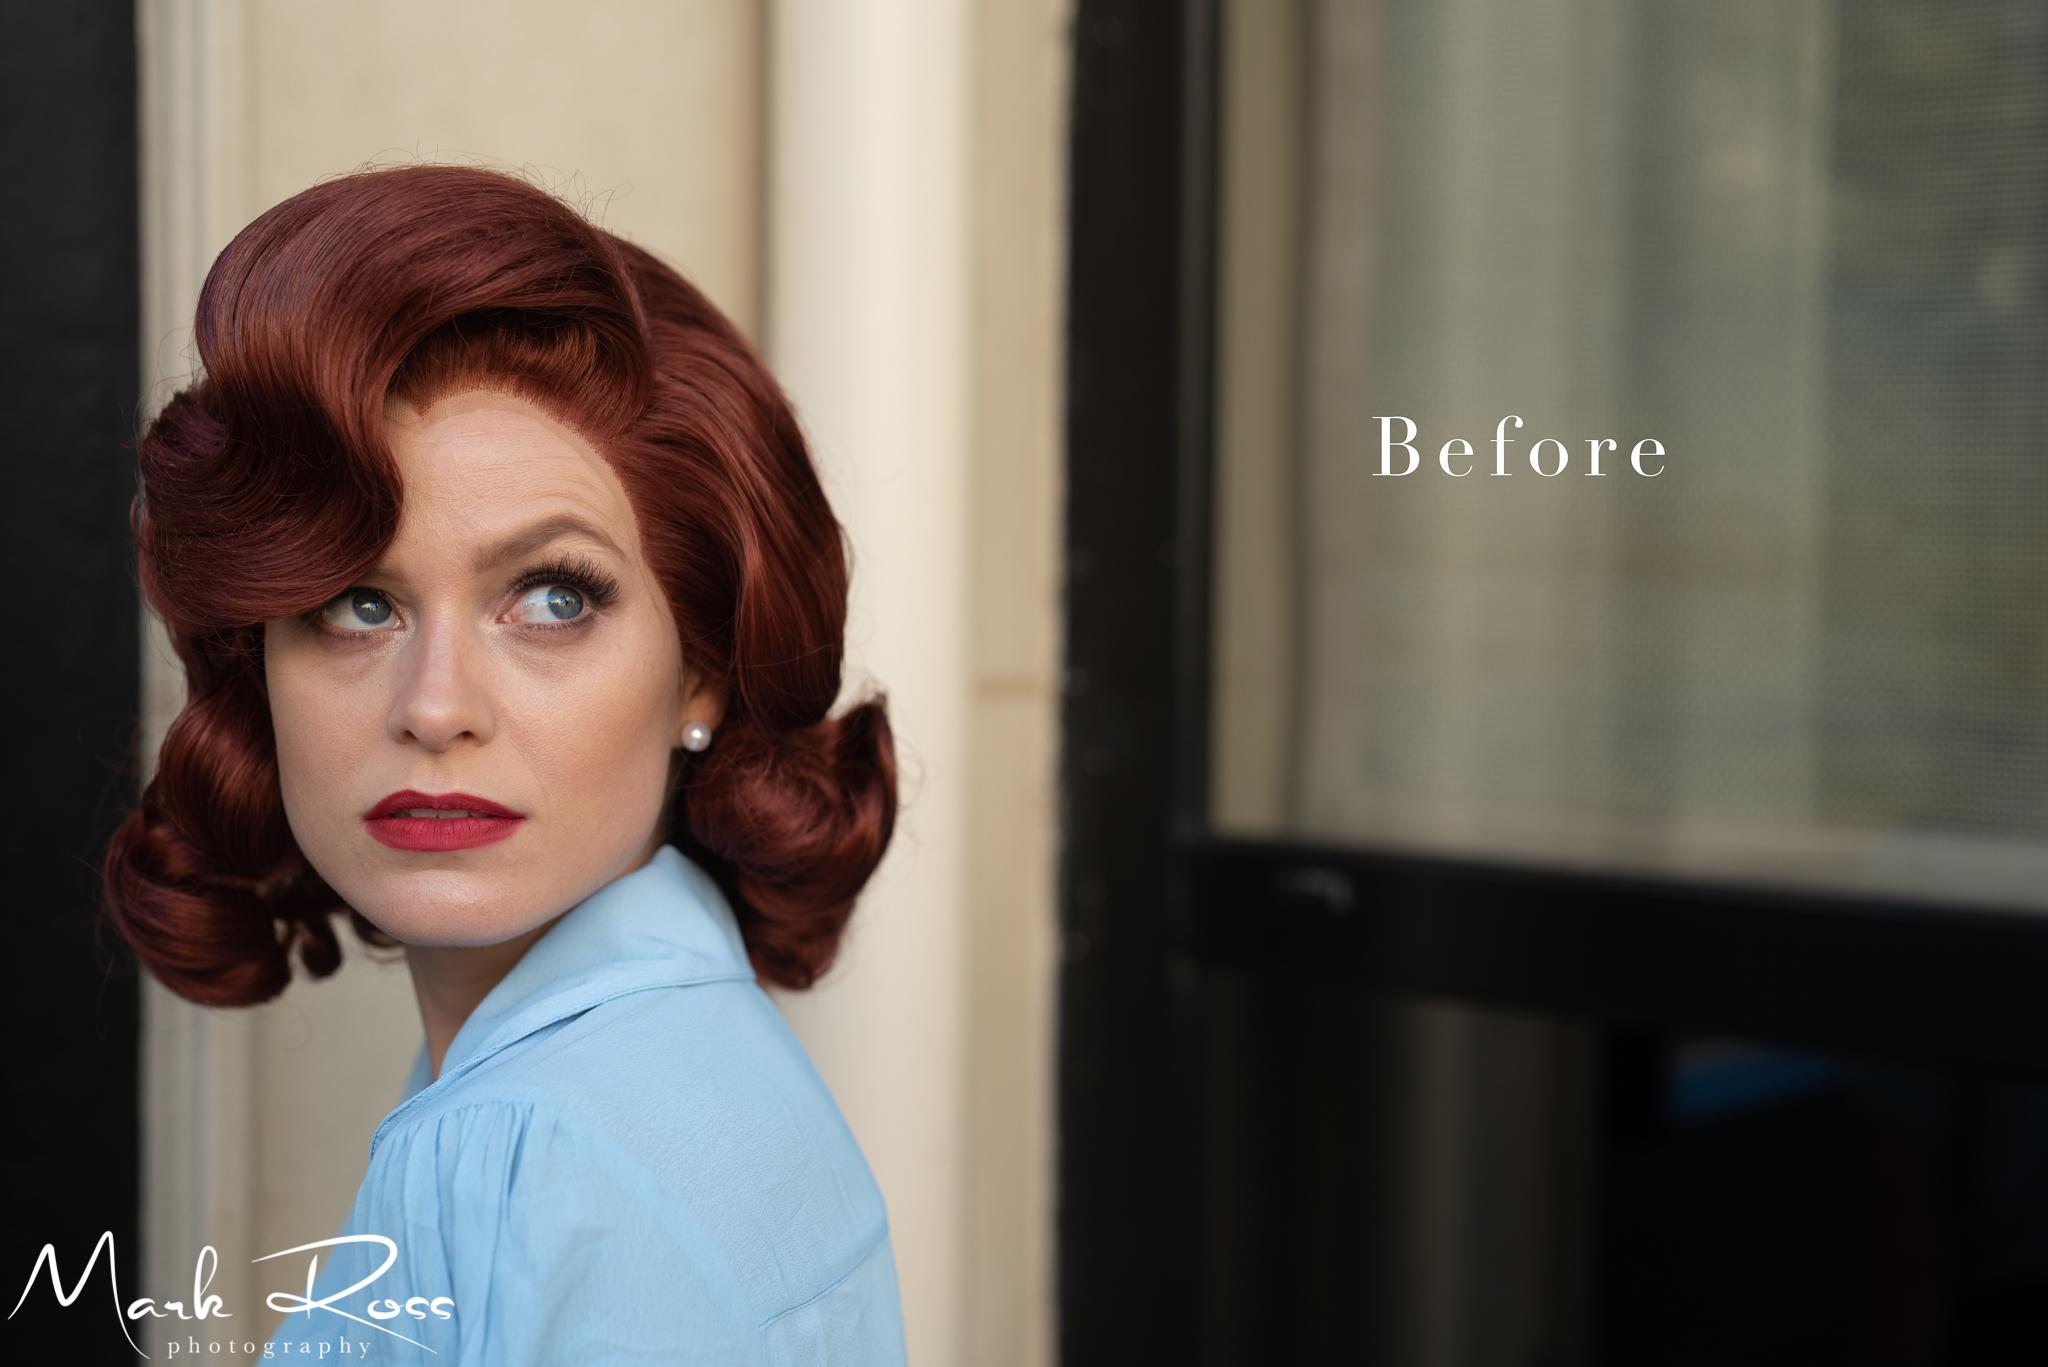 Denver-Portrait-Photographer-Mark-Ross-Photography-Maggie-Paris-2018-40s-blue-Web-Resolution-Watermarked-5.jpg